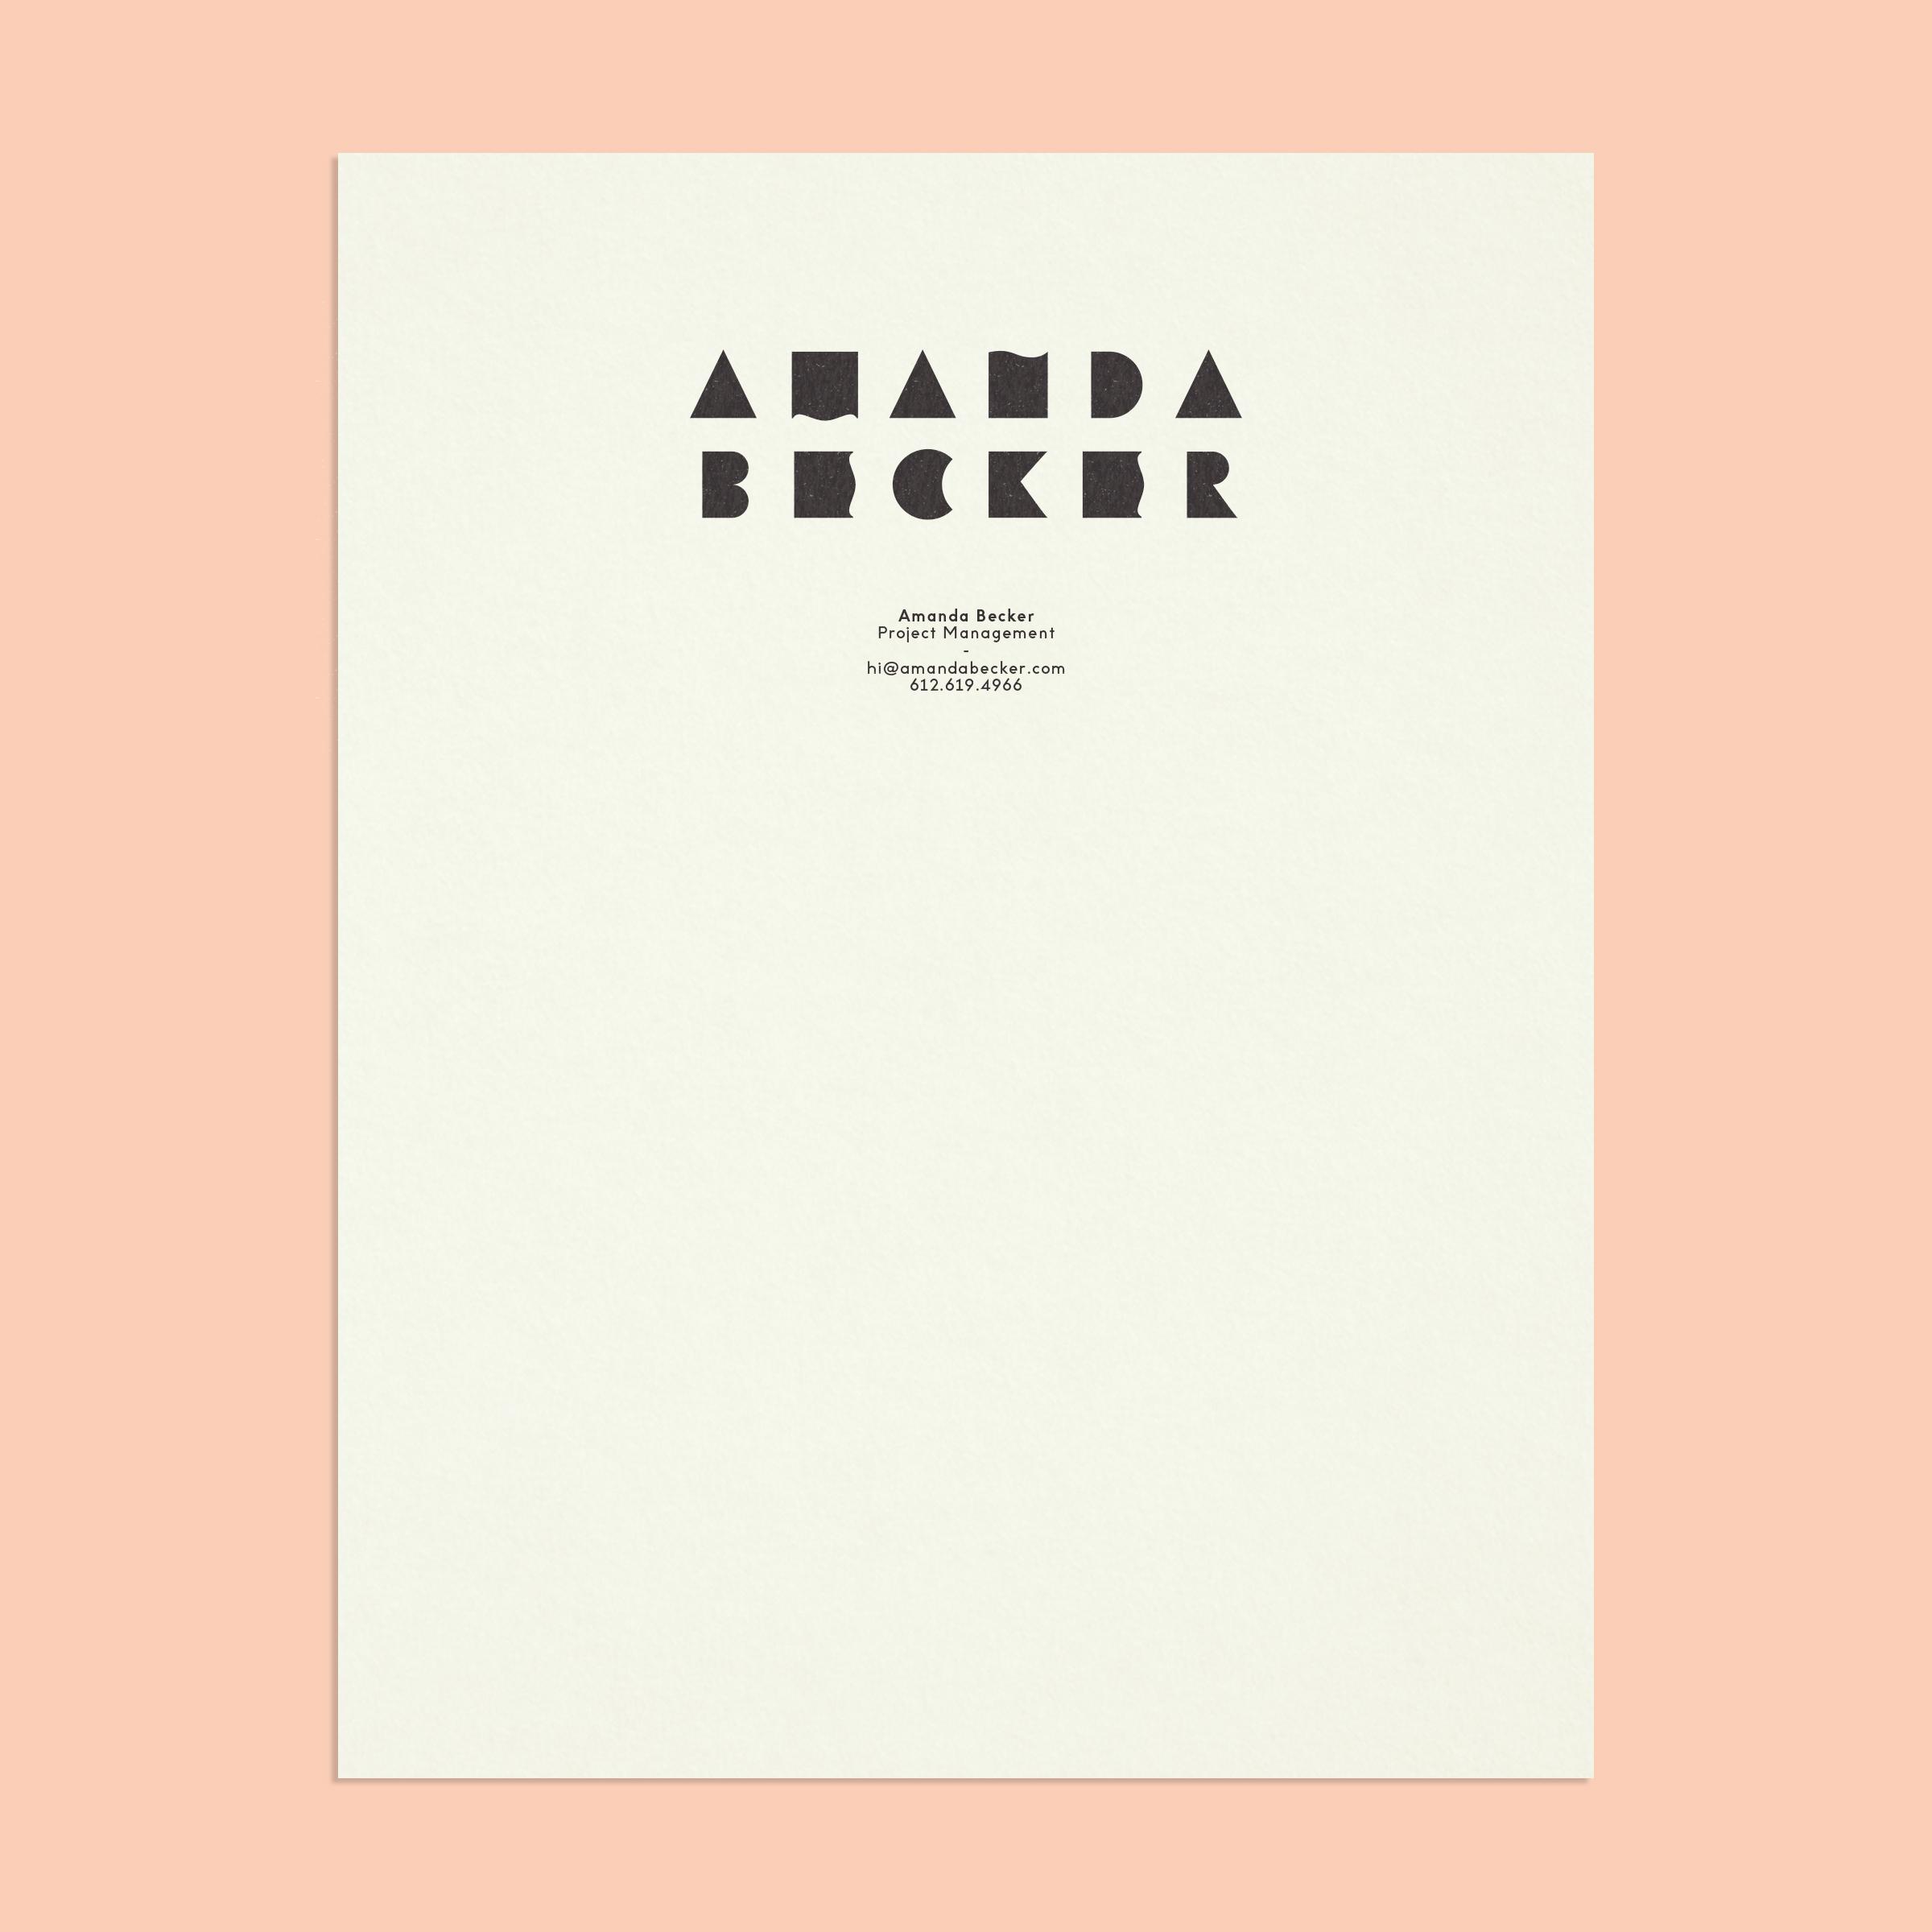 Amanda Becker stationery. Identity designed by Minneapolis designer Abby Haddican.